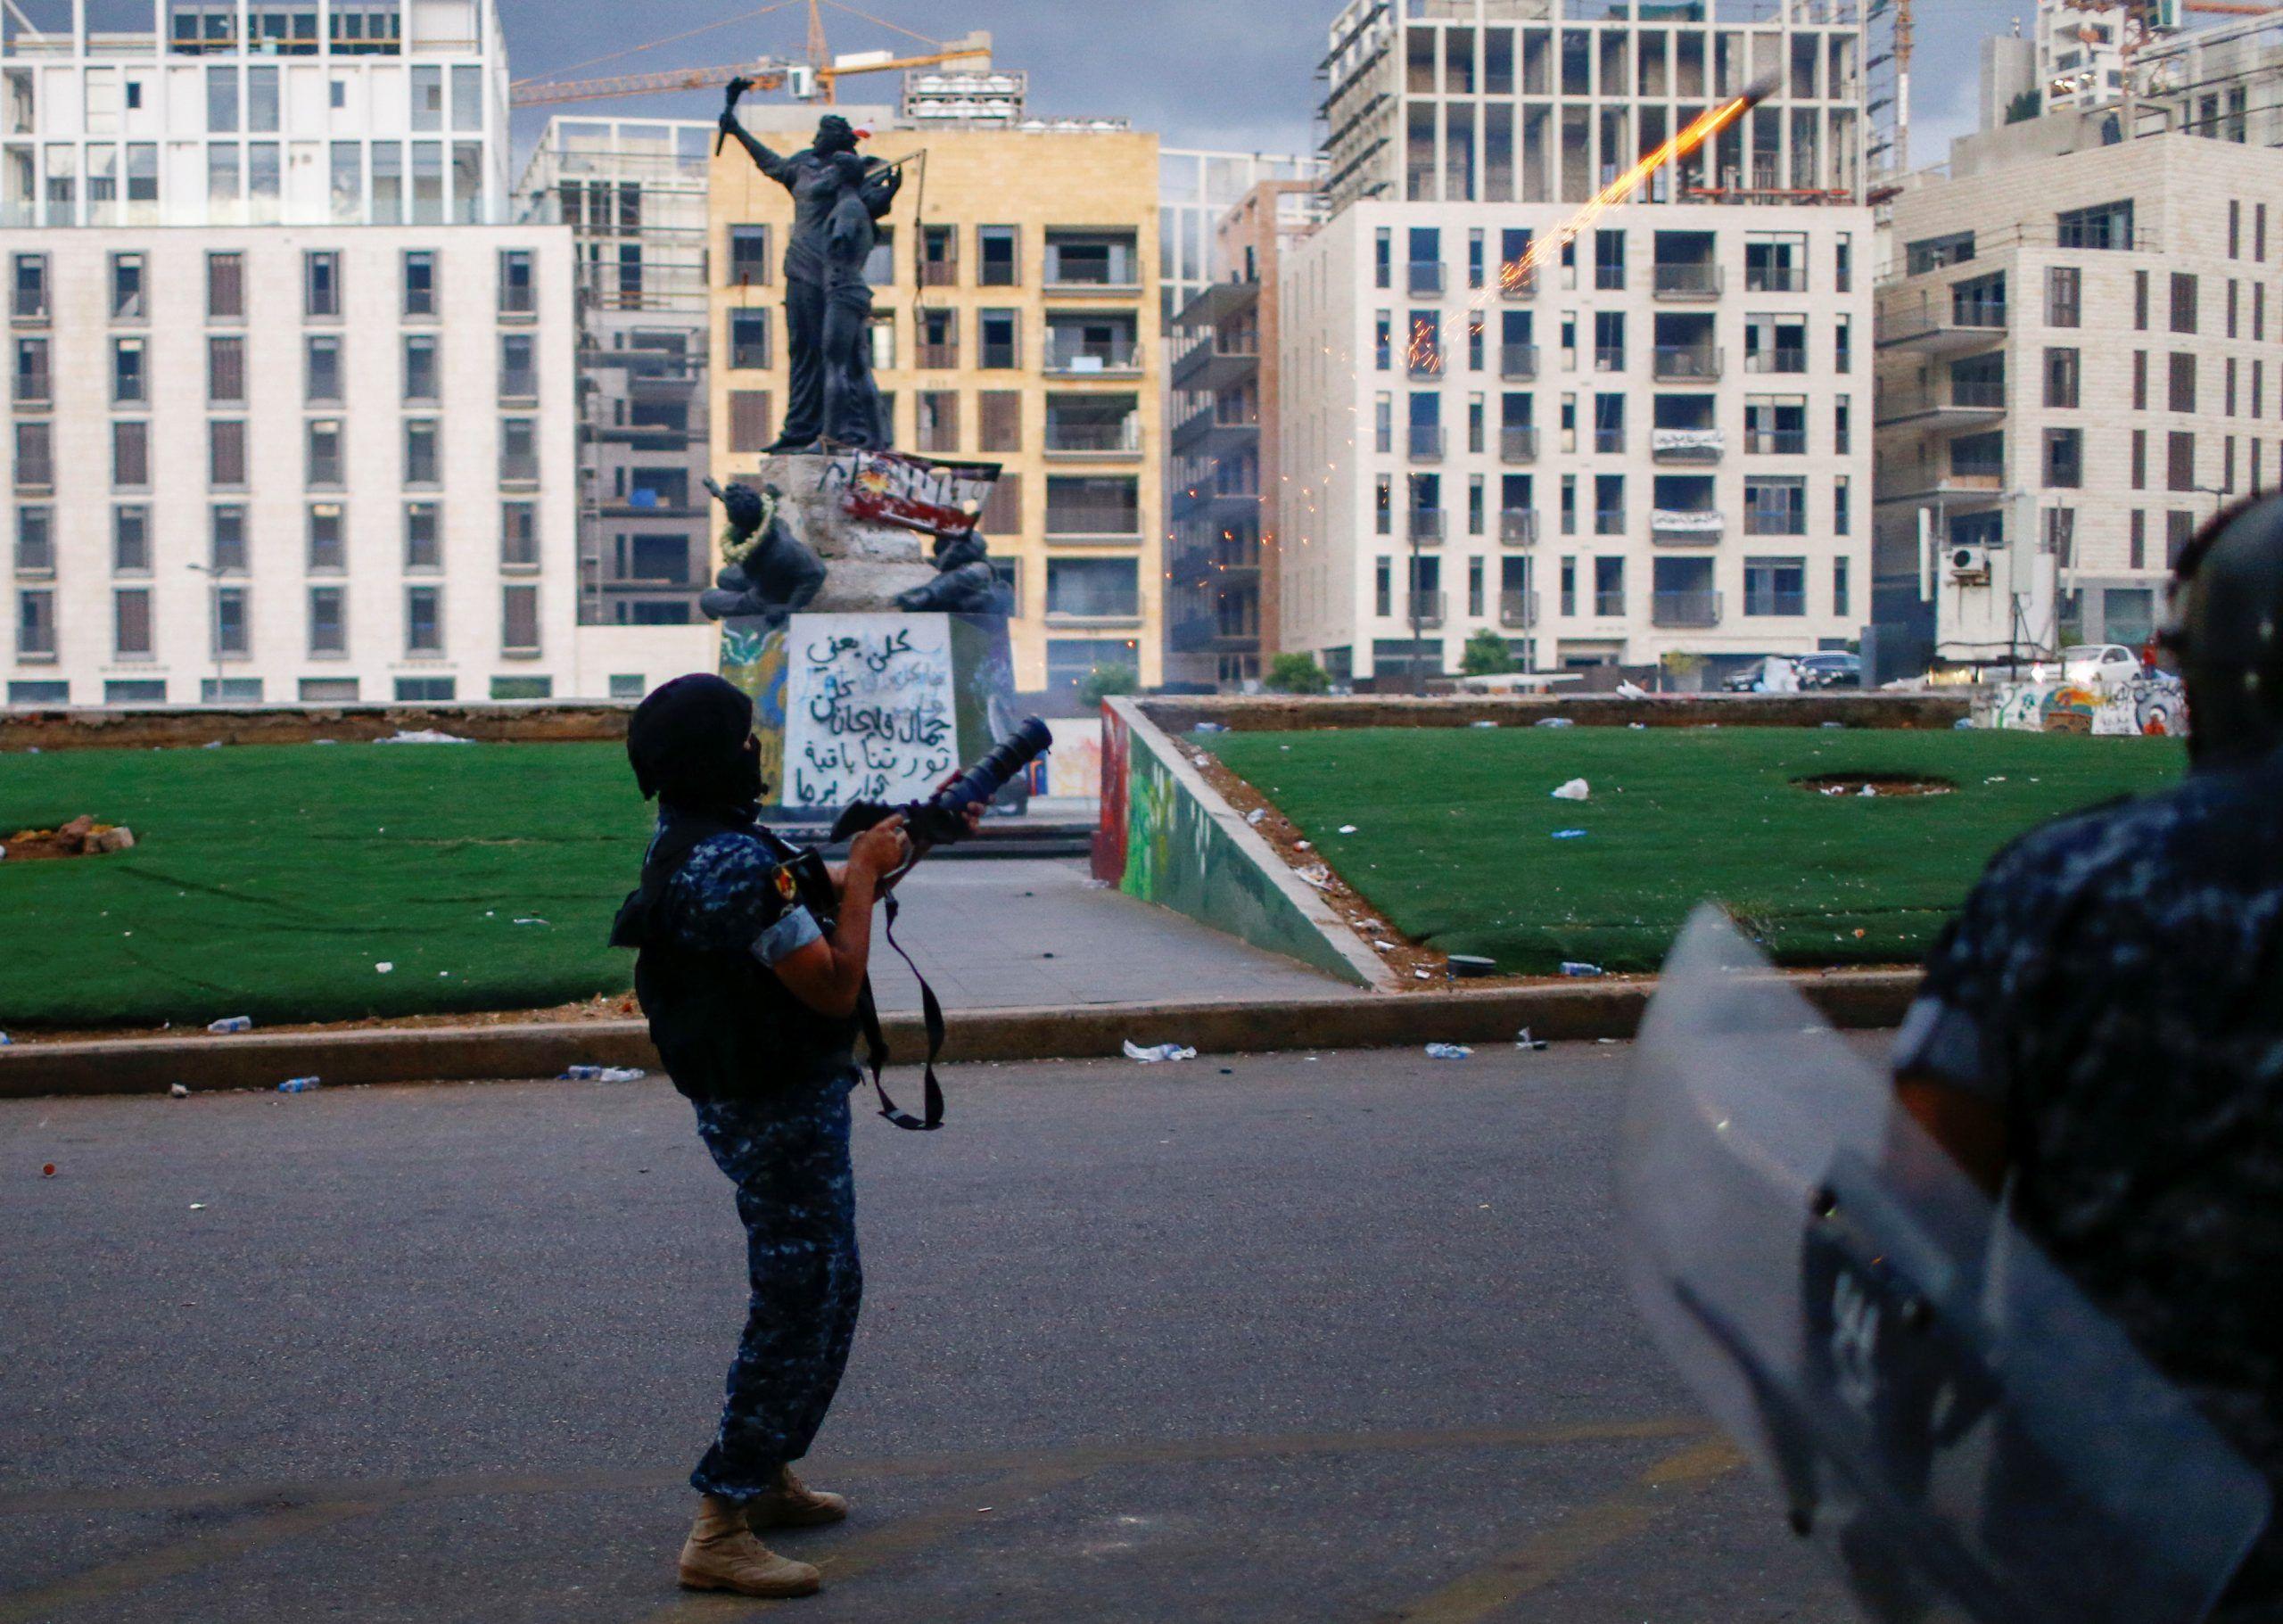 2020-08-10T180649Z_1036694200_RC26BI99ZW3U_RTRMADP_3_LEBANON-SECURITY-BLAST-PROTESTS-scaled